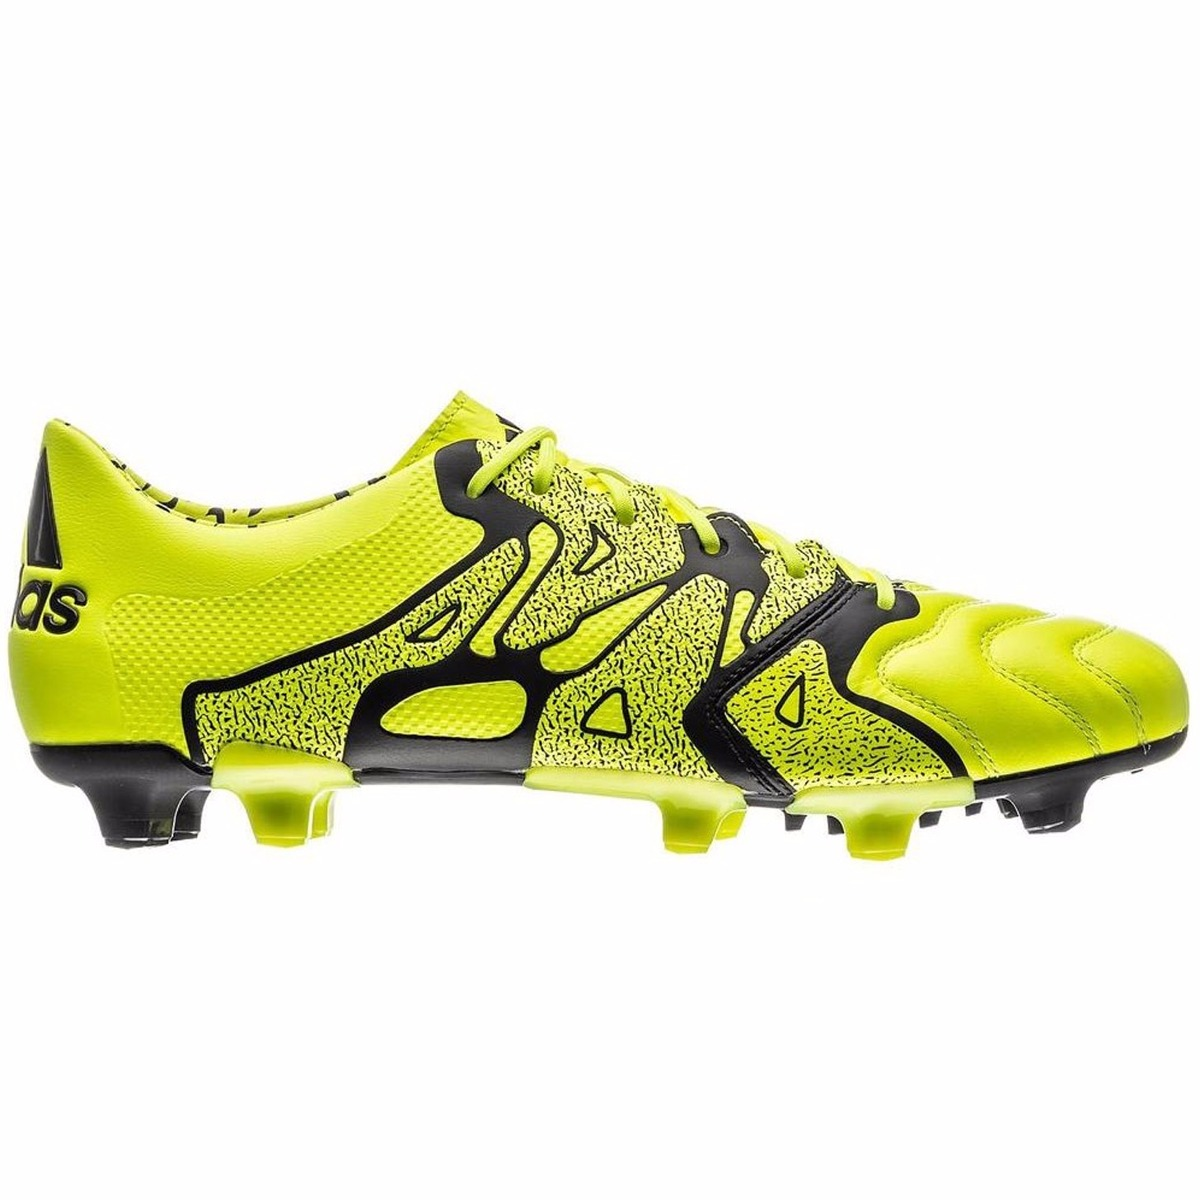 best website 1d68c e2f97 zapatos futbol soccer profesionales x 15.1 adidas b26979 ...